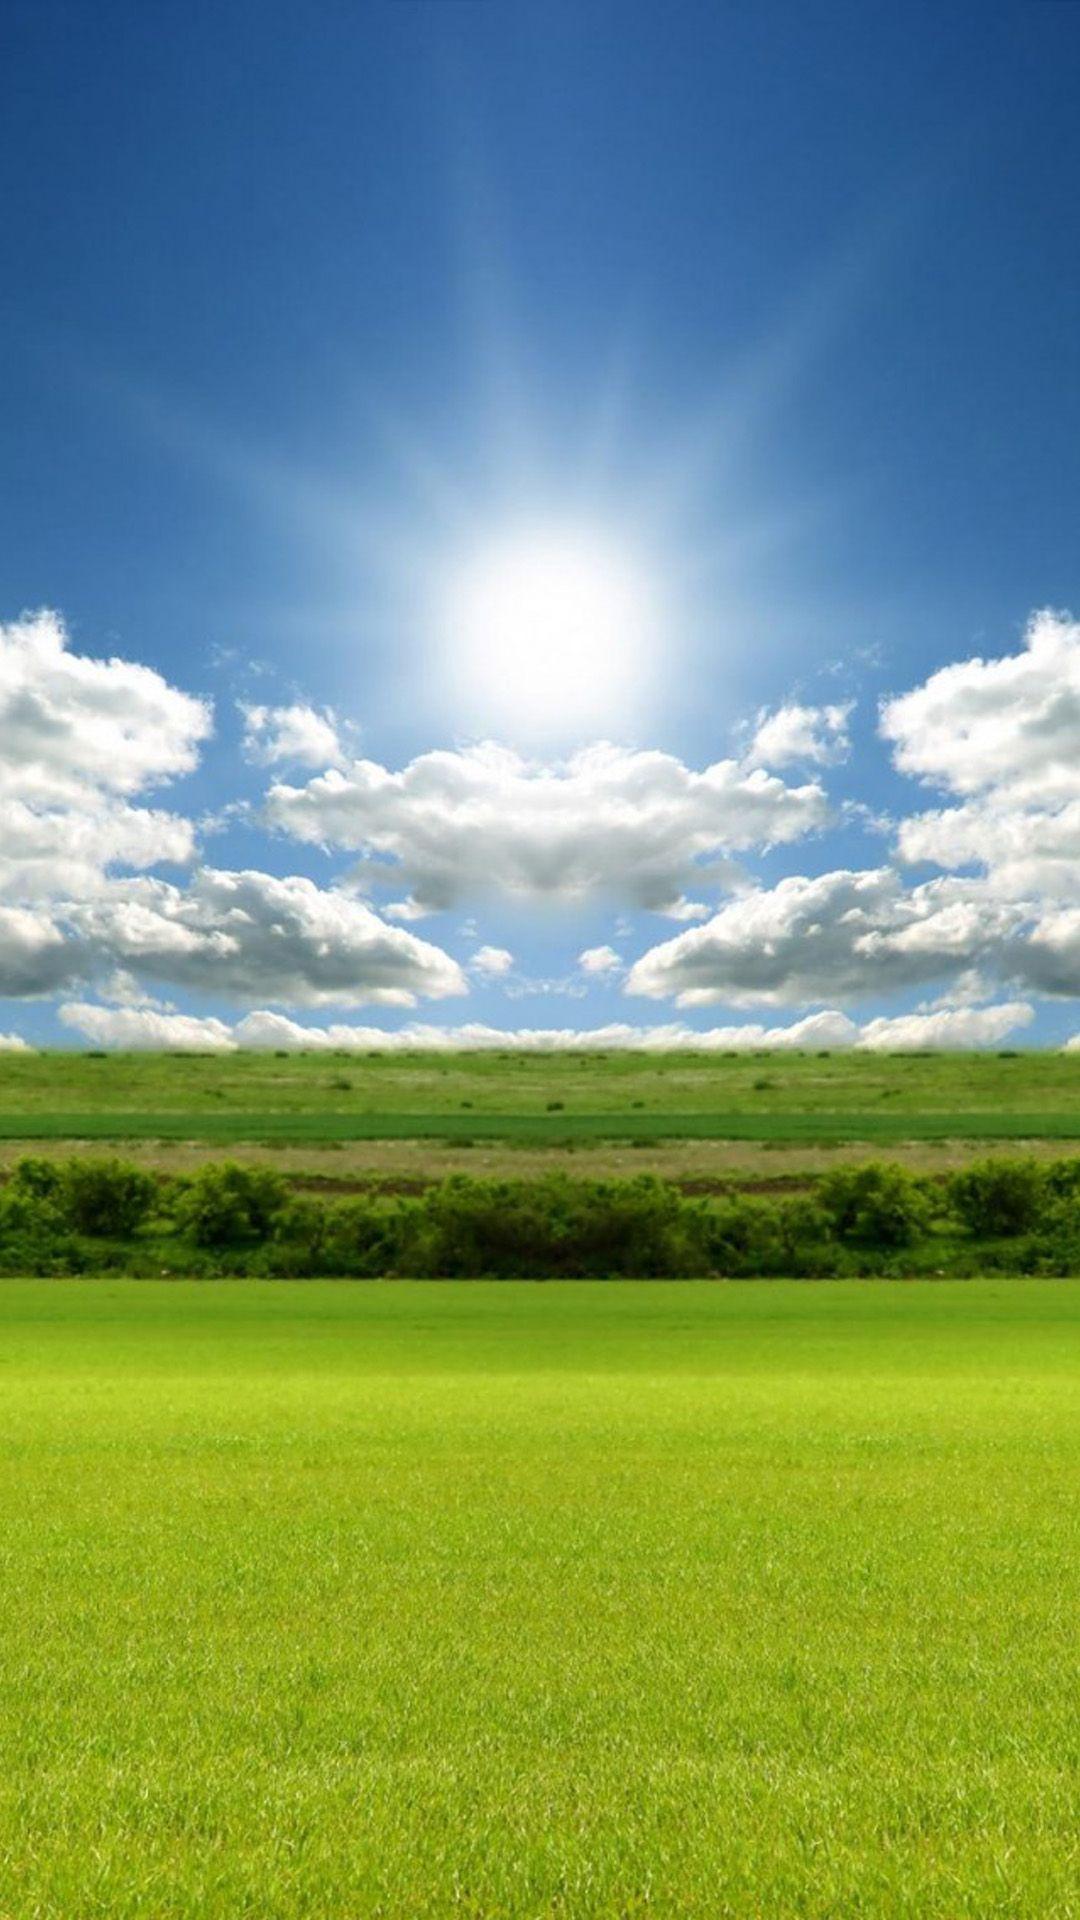 Hd wallpaper qmobile - Sunlight Nature Green Field Sky Iphone 6 Plus Wallpaper